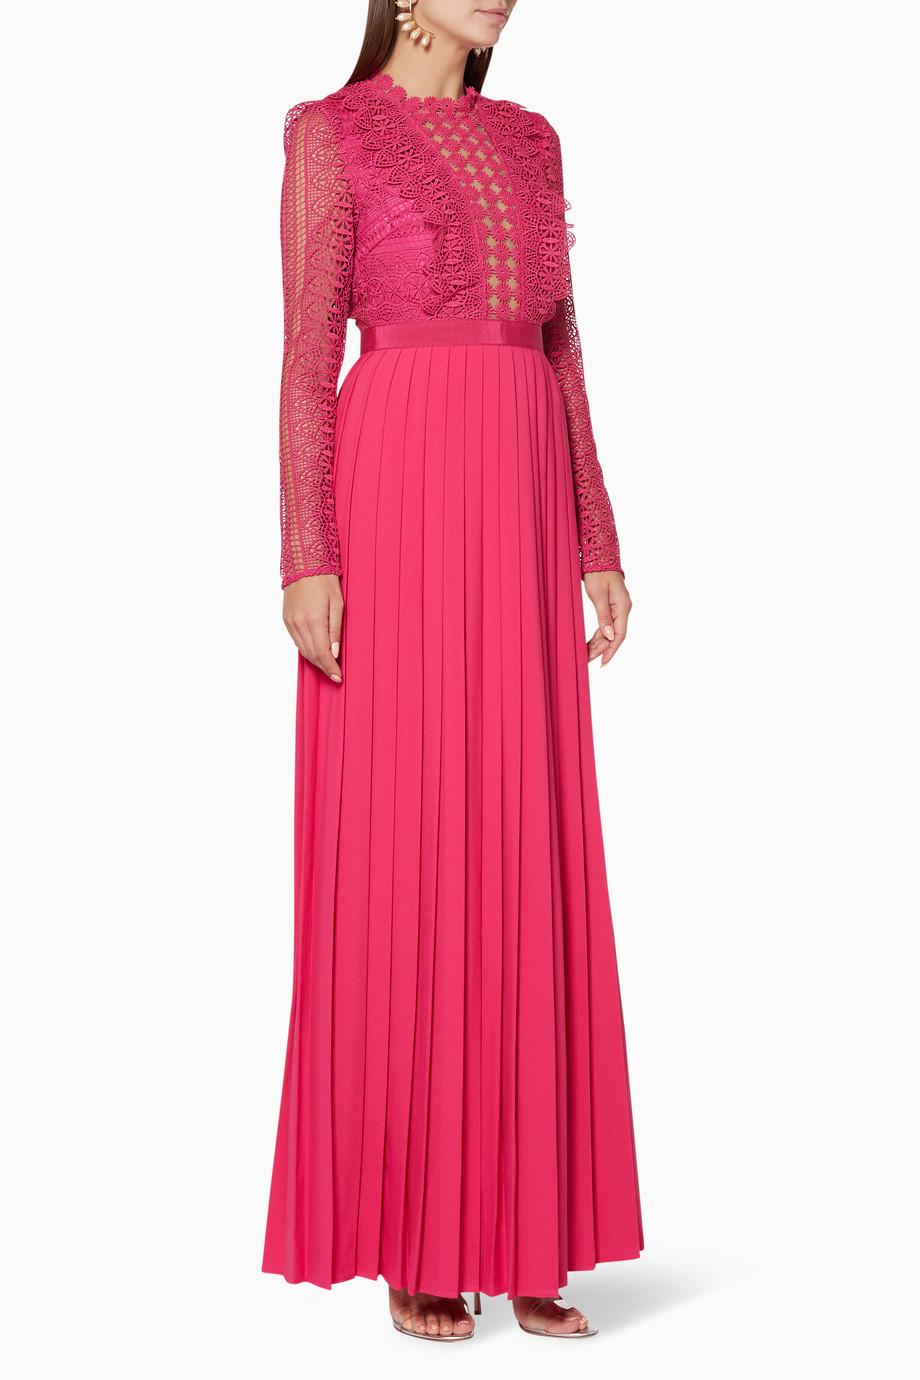 43e9d16b108e Shop Self-Portrait Pink Fuchsia Spiral-Lace Maxi Dress for Women ...